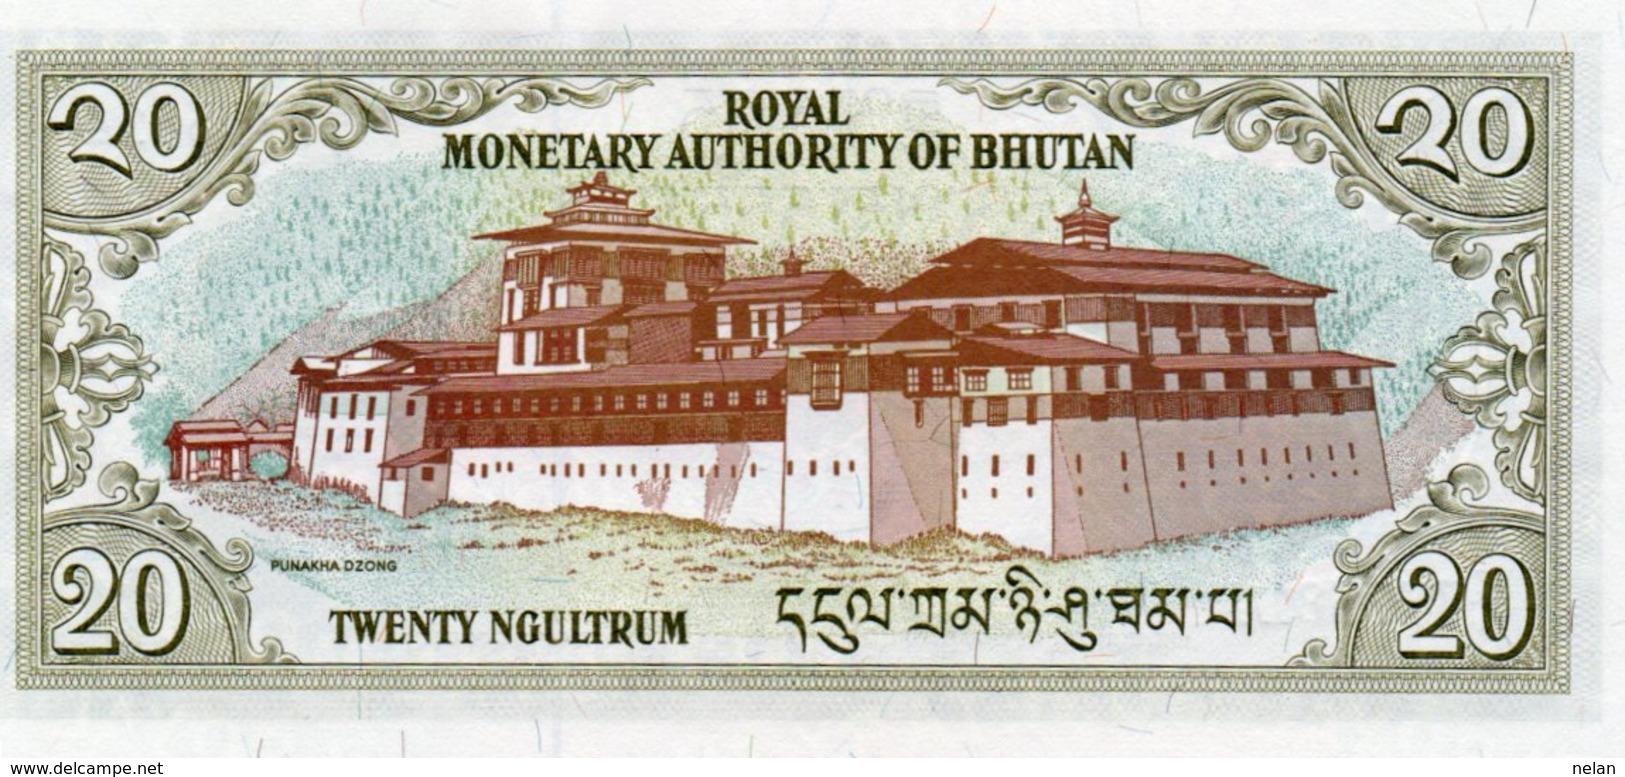 BHUTAN 20 NGULTRUM 2000 P-23 UNC - Bhoutan